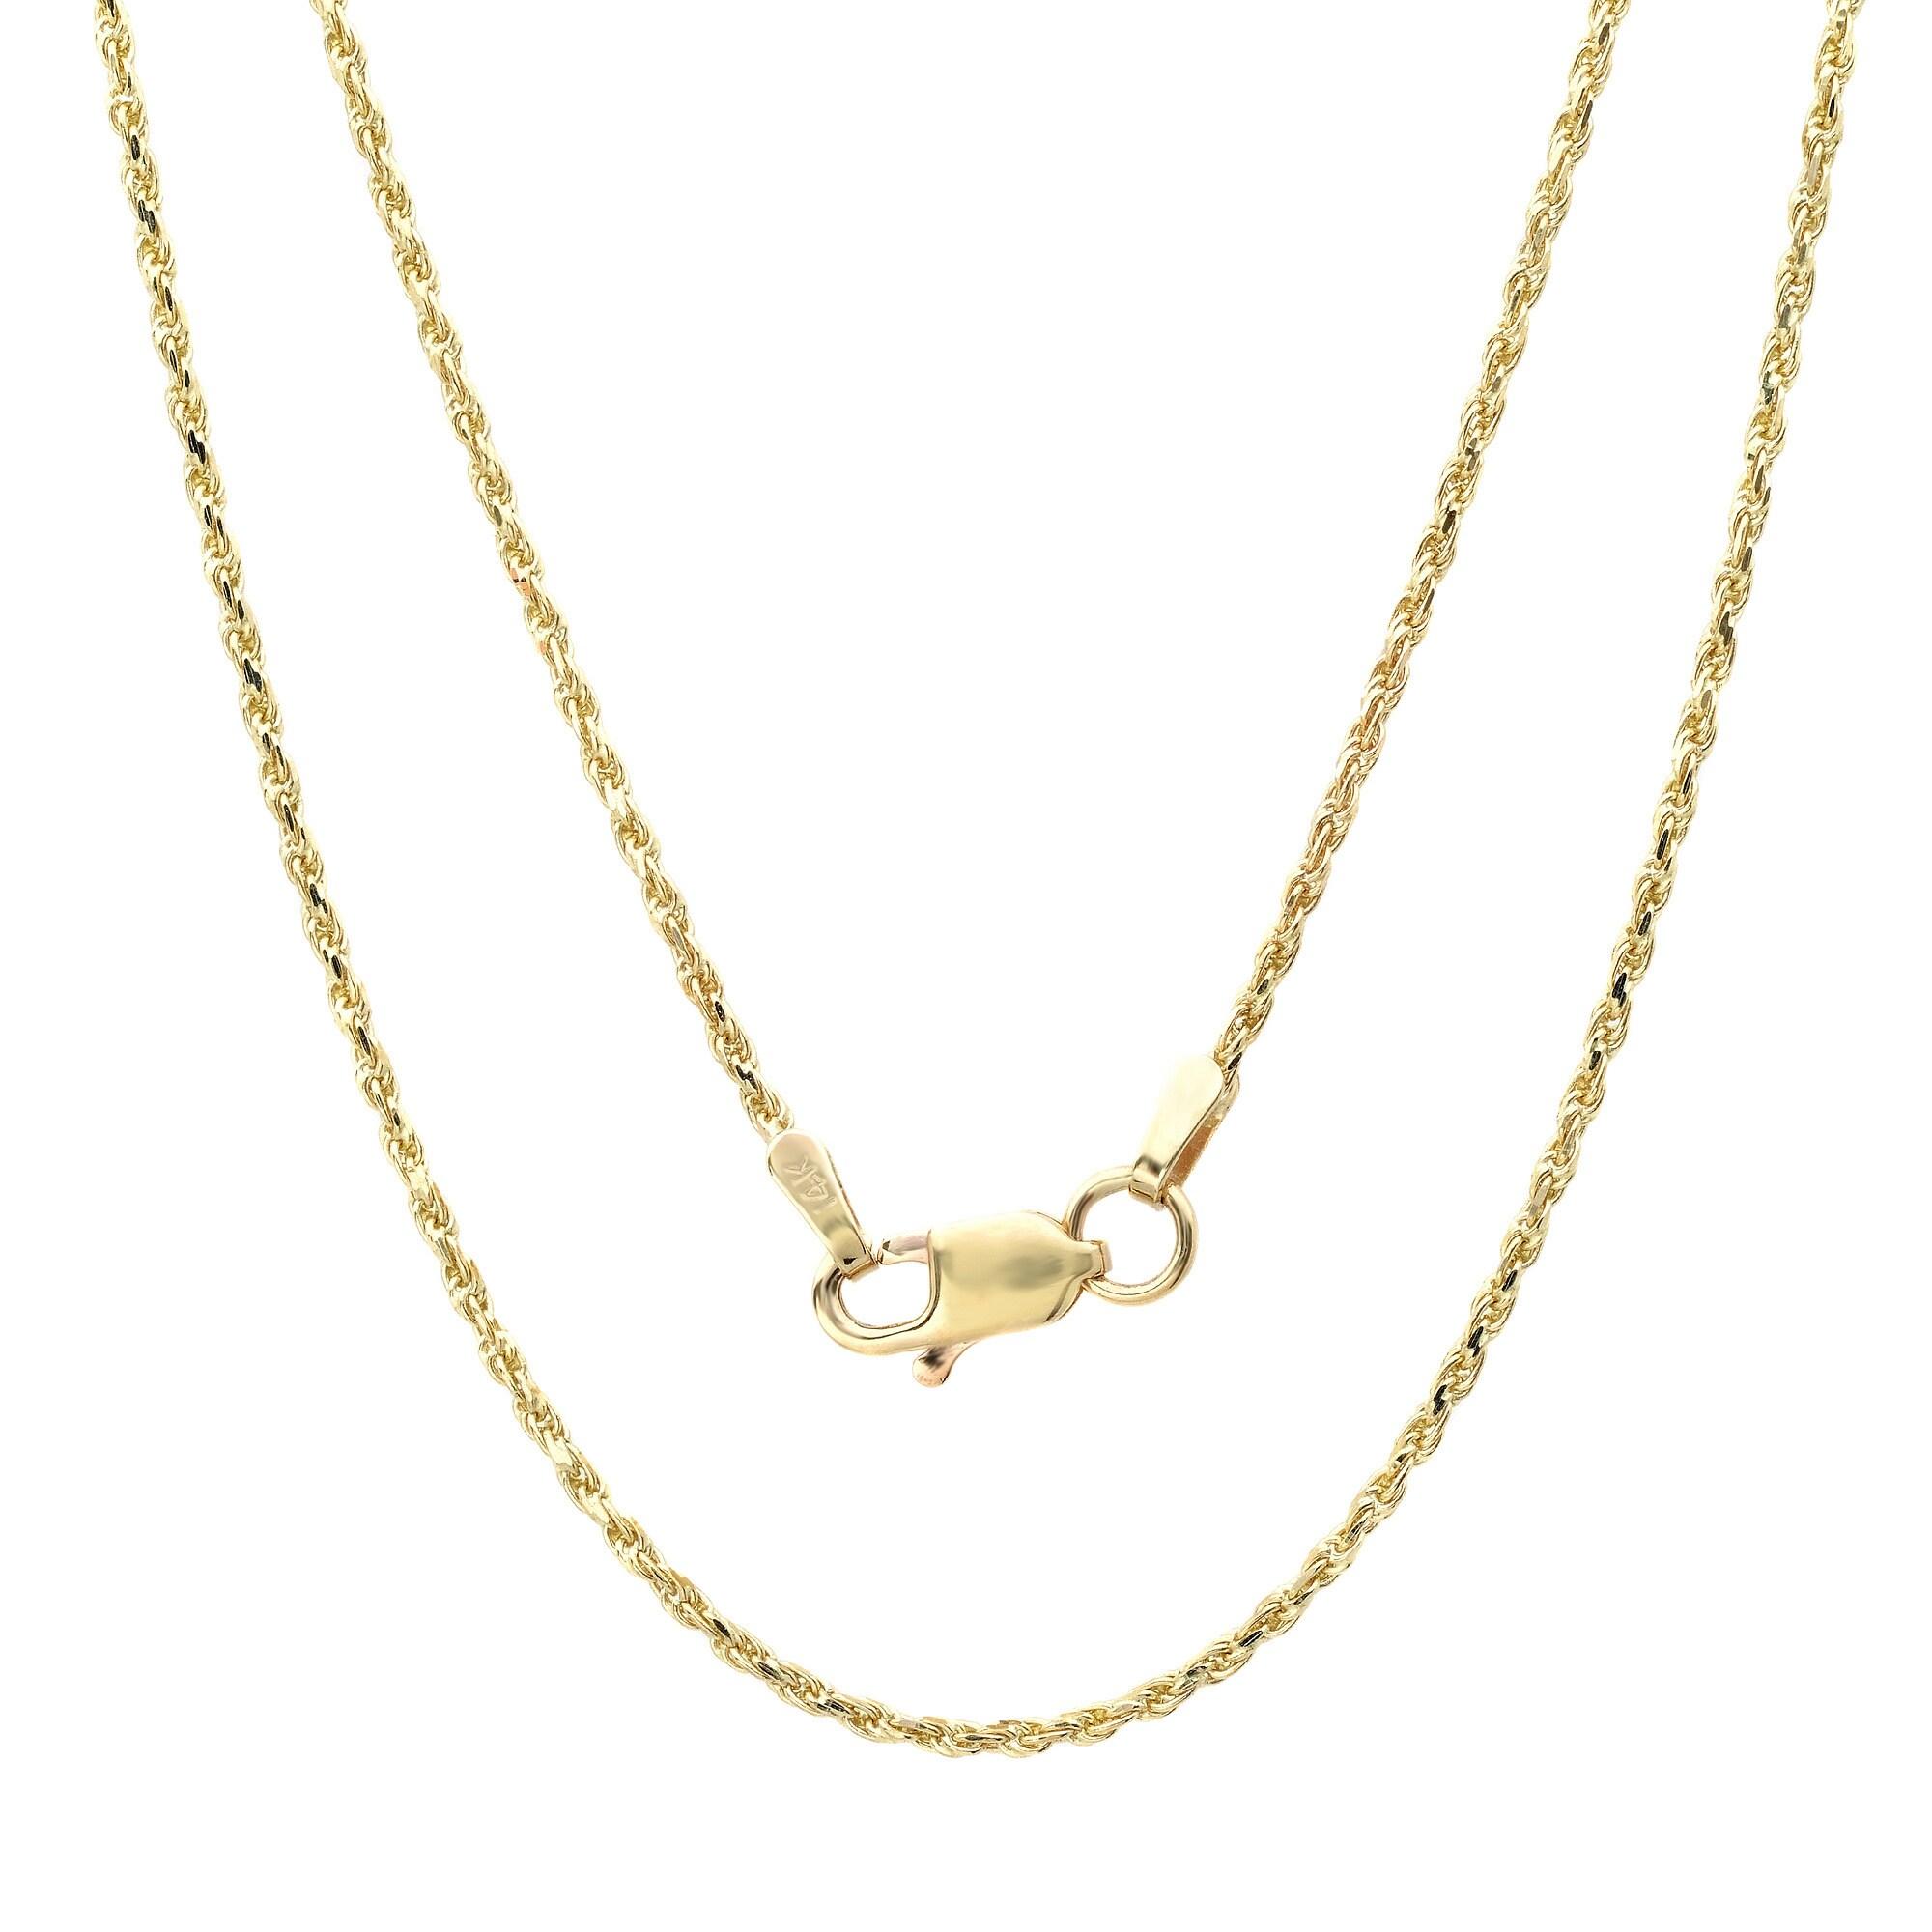 9896aeb006faf Roberto Martinez 14k Yellow Gold Diamond-Cut Rope Chain Necklace